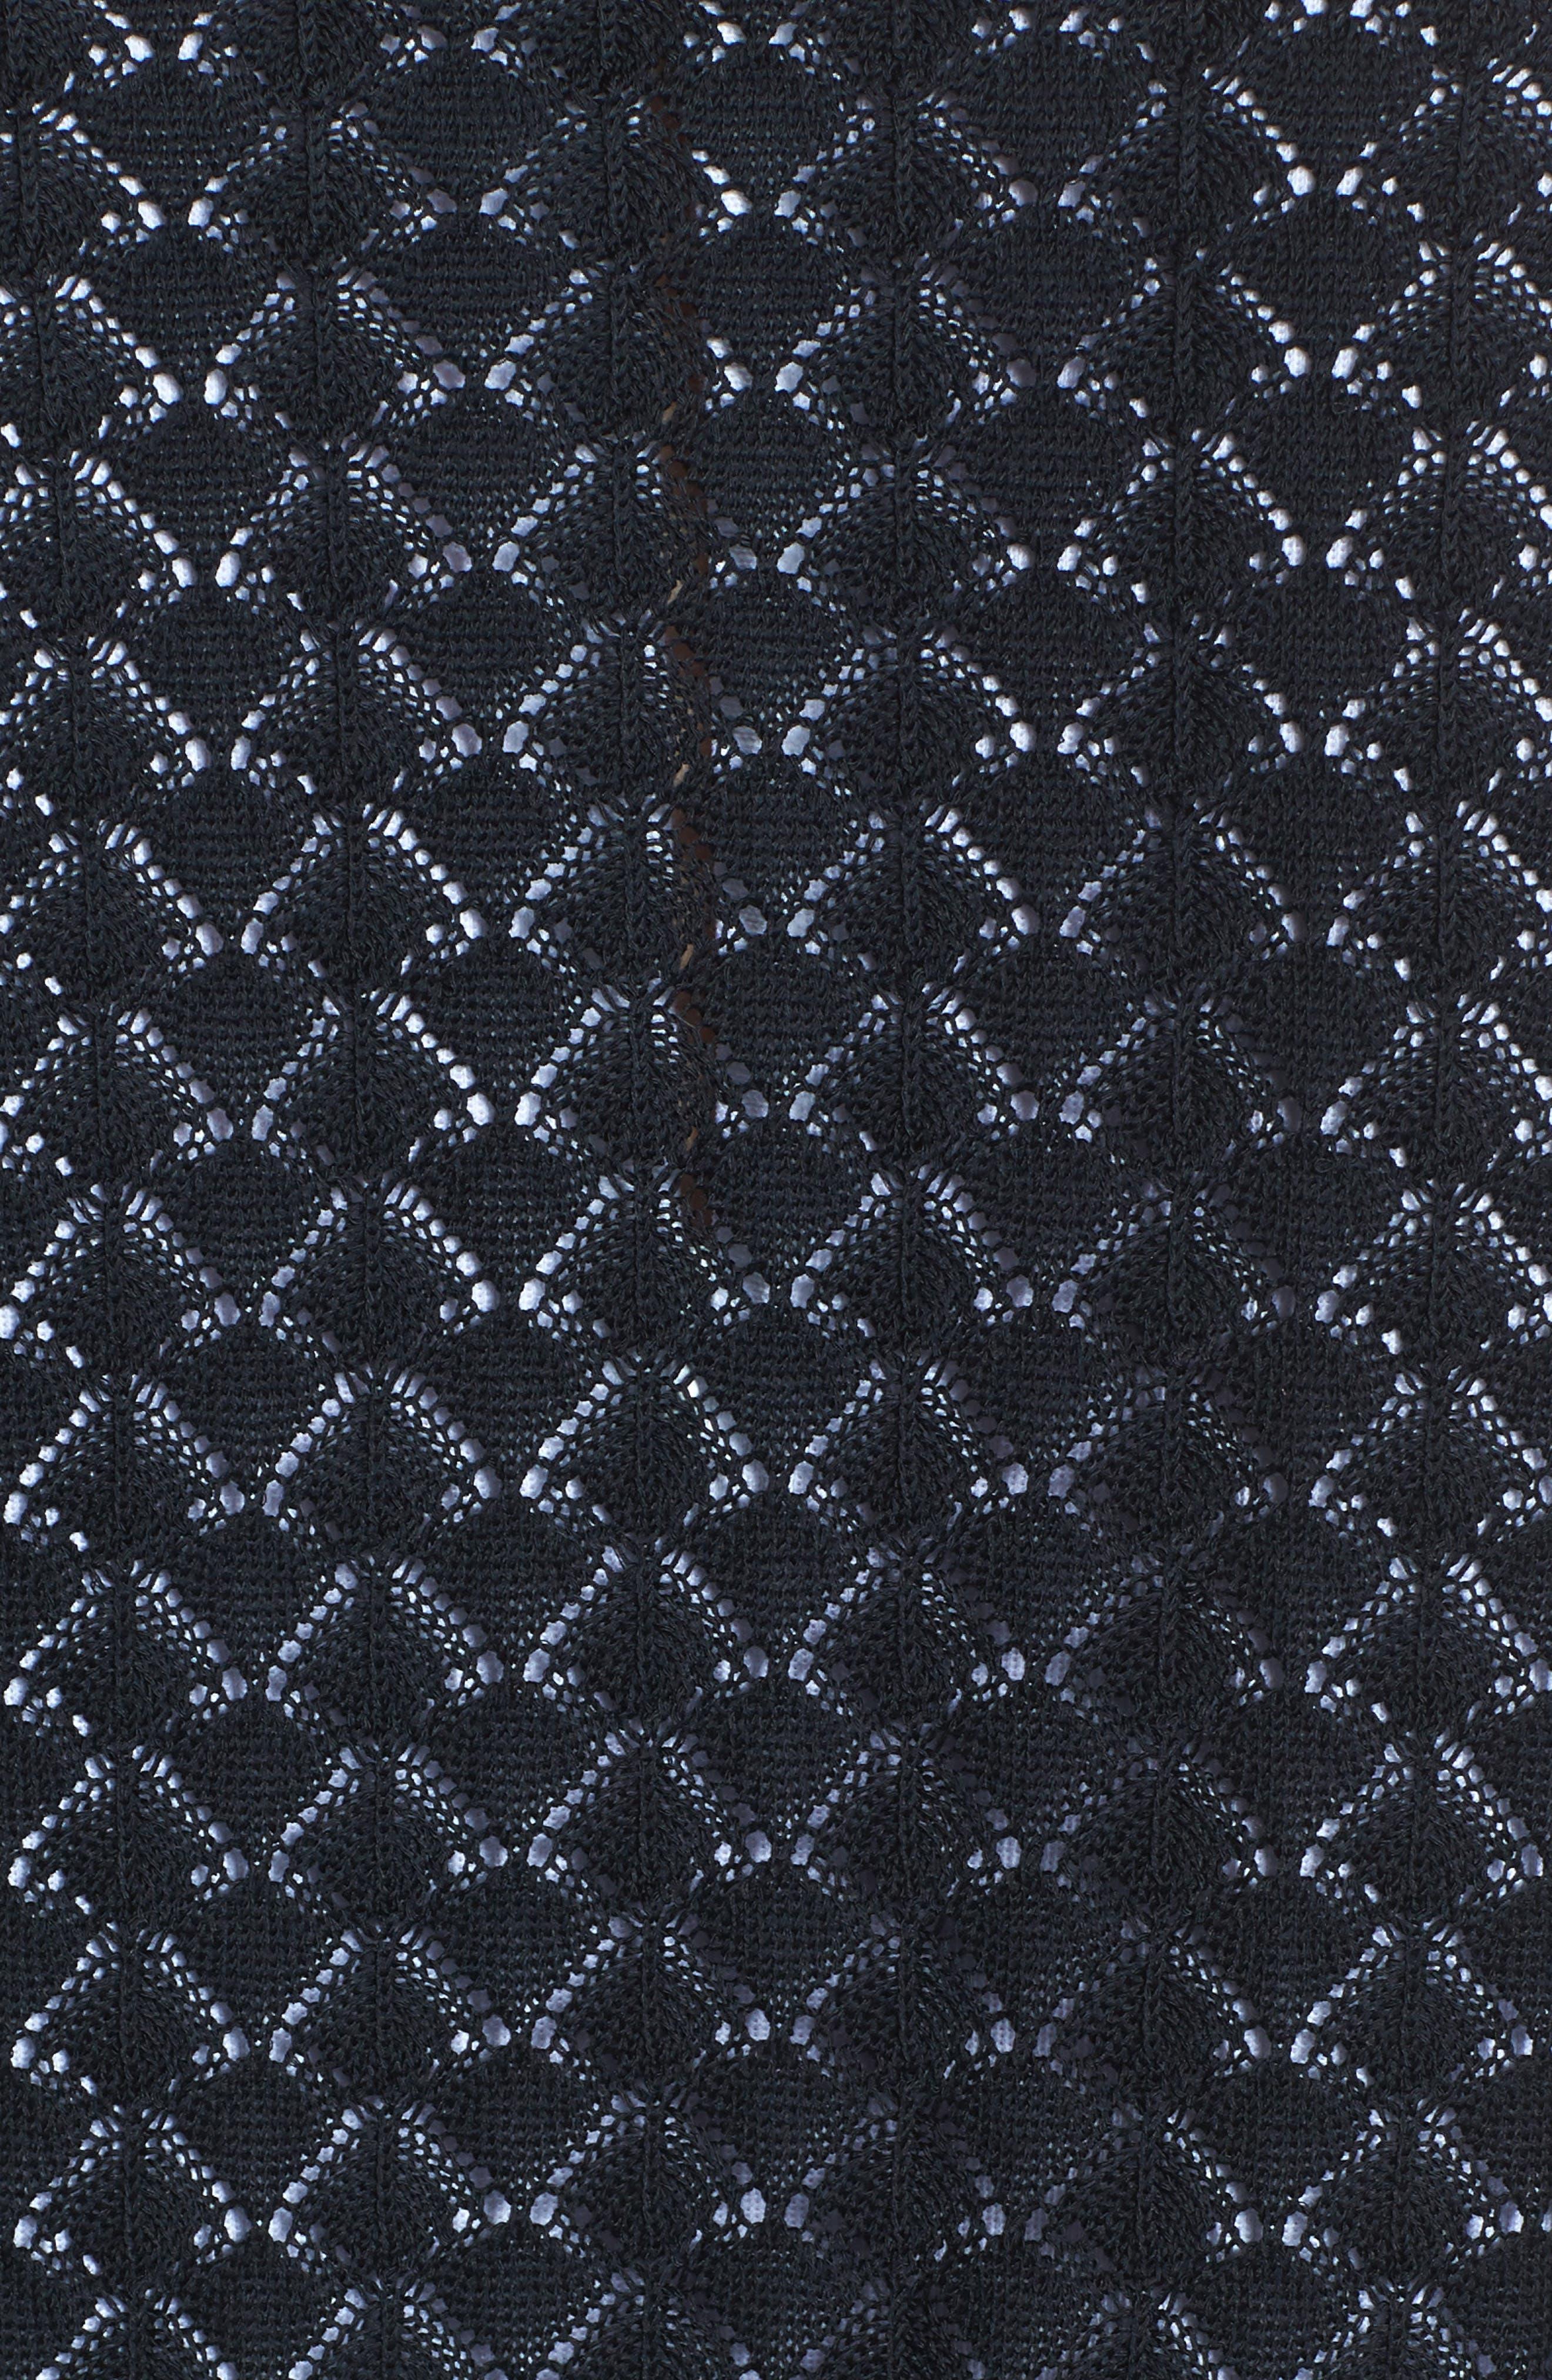 Studded Pointelle Sweater Jacket,                             Alternate thumbnail 6, color,                             001